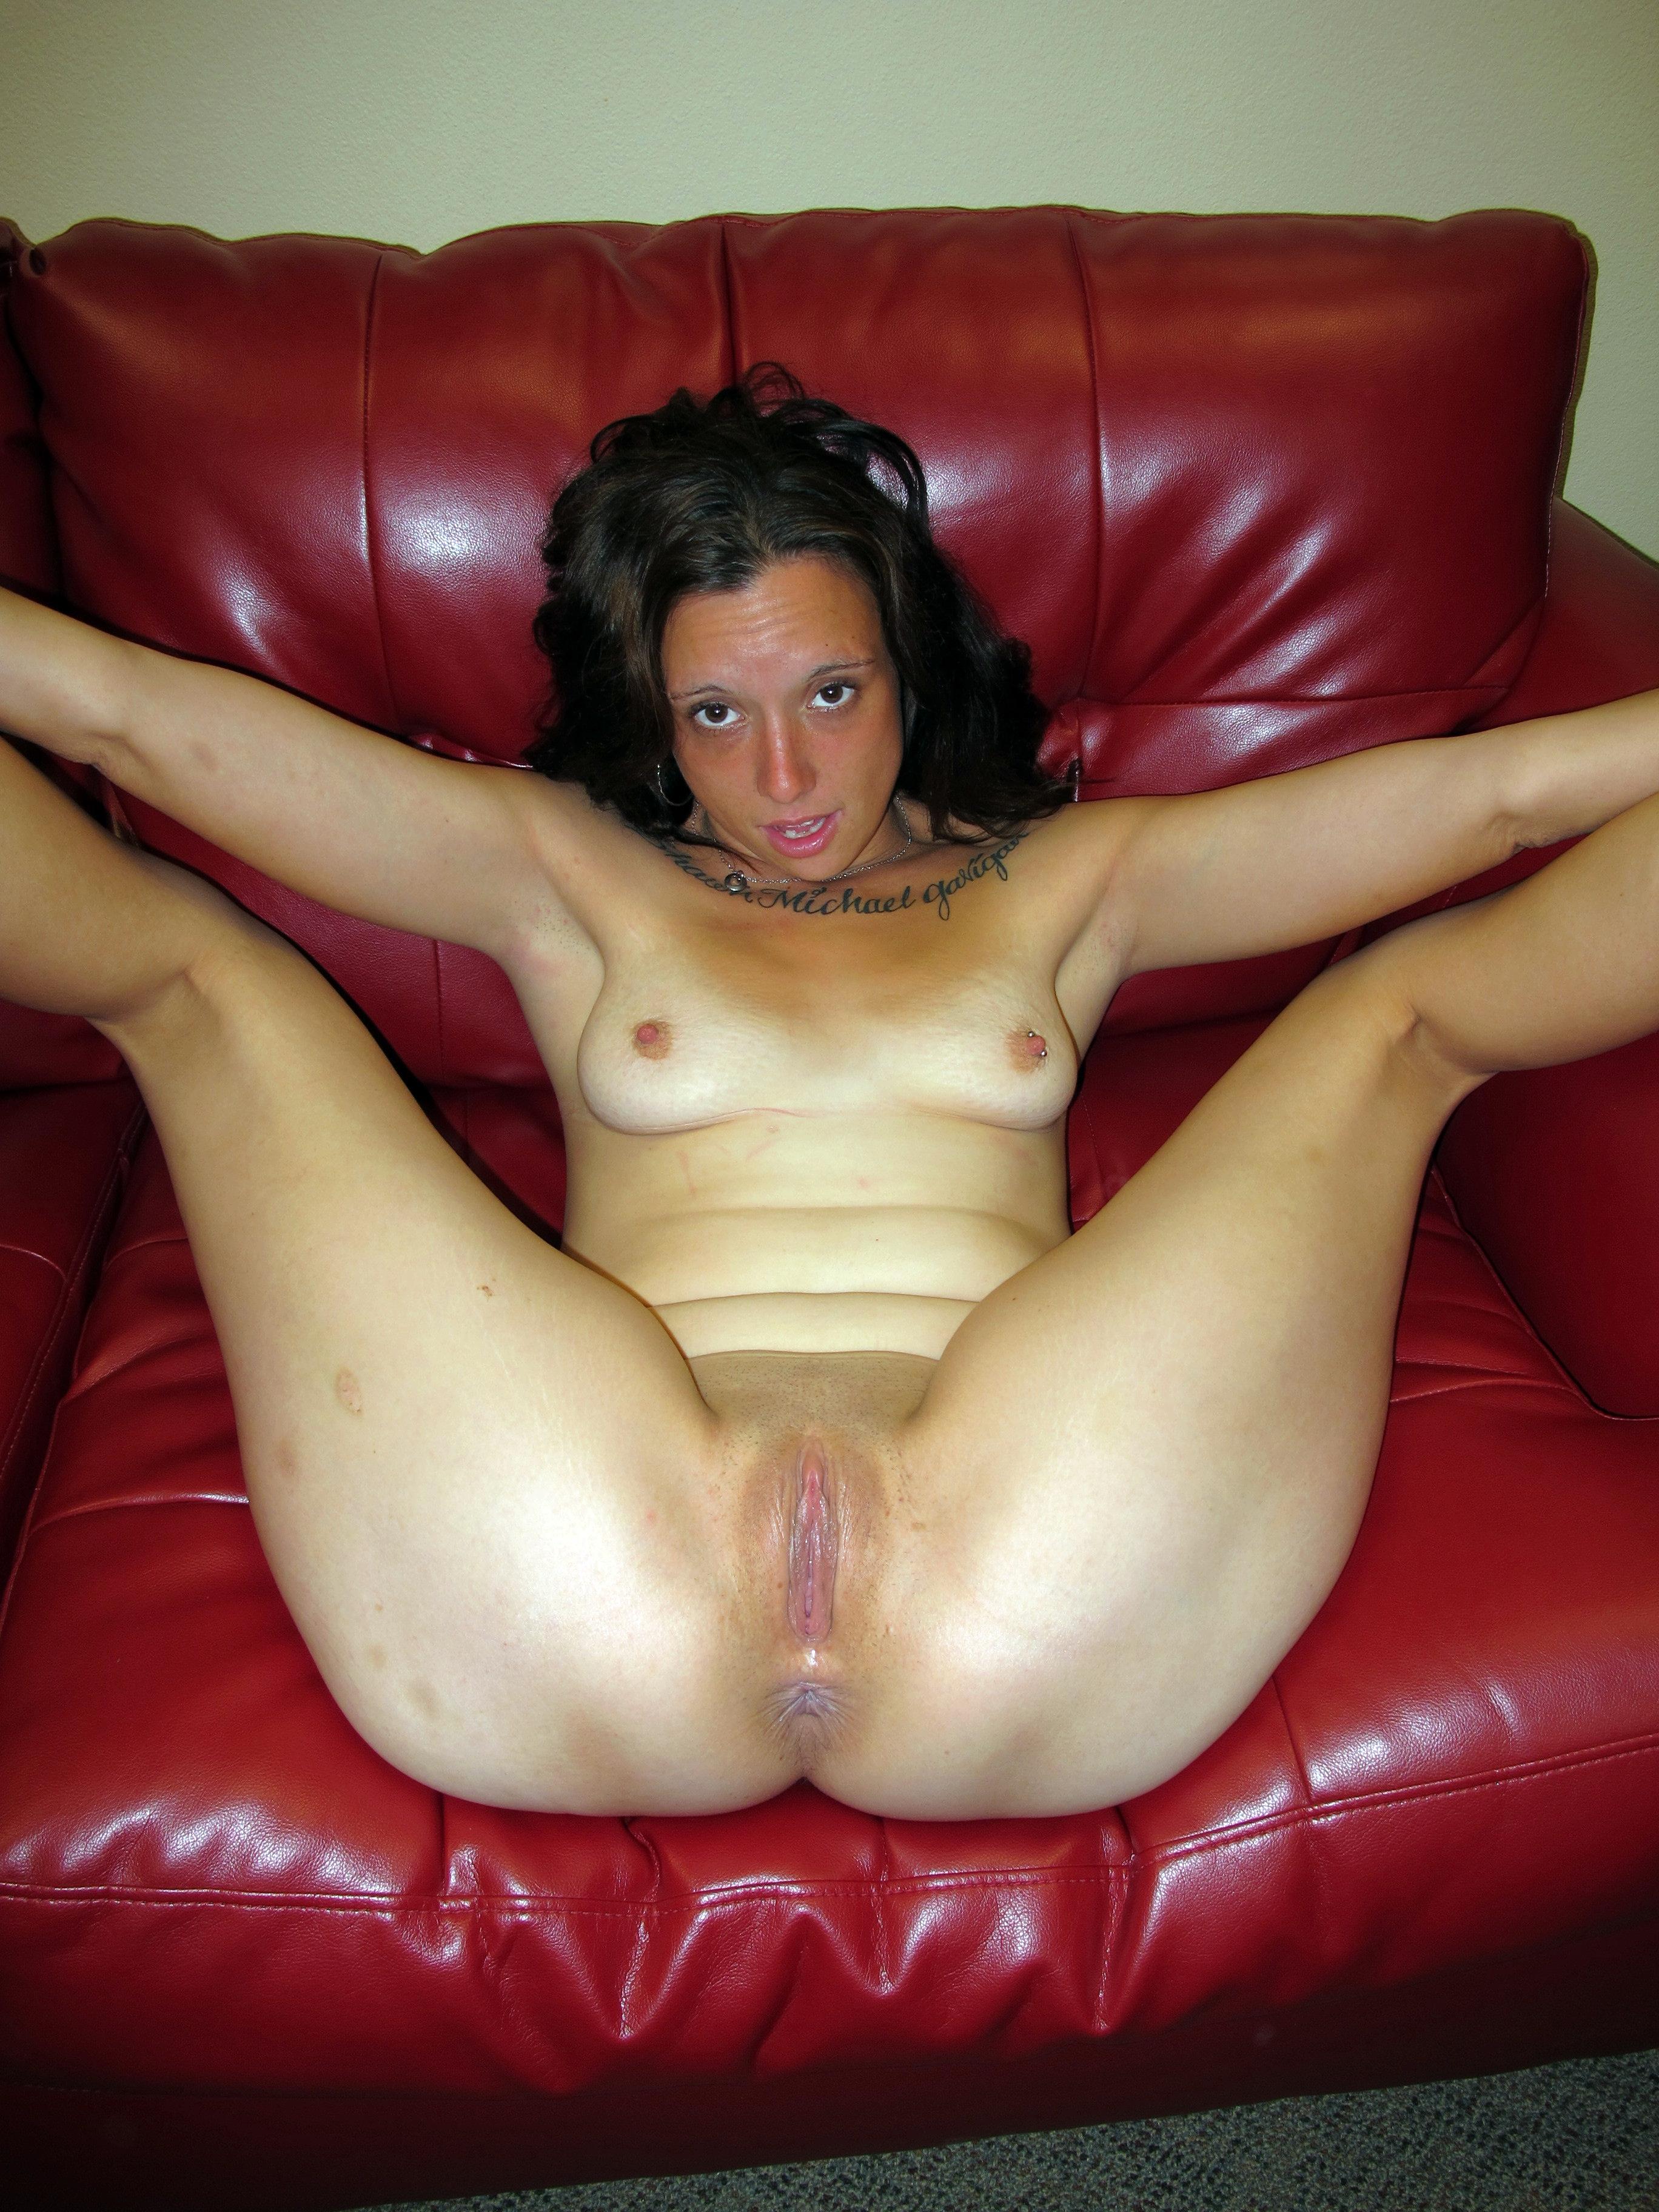 Nude photo upload site